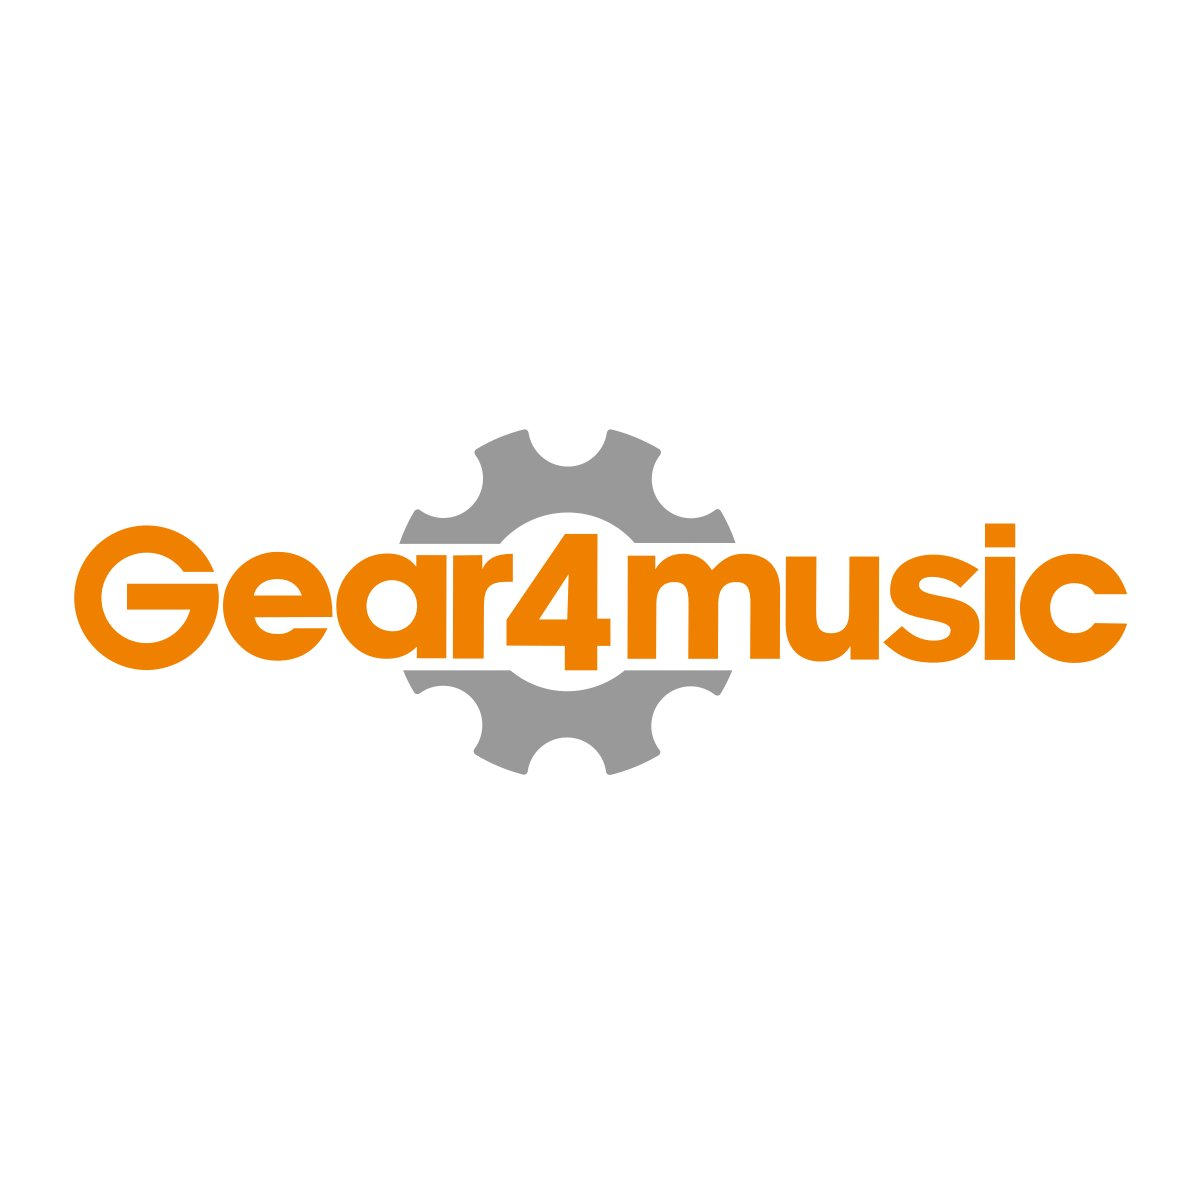 3/4 de viagem Electro-Acoustic Guitar  Gear4music, preto